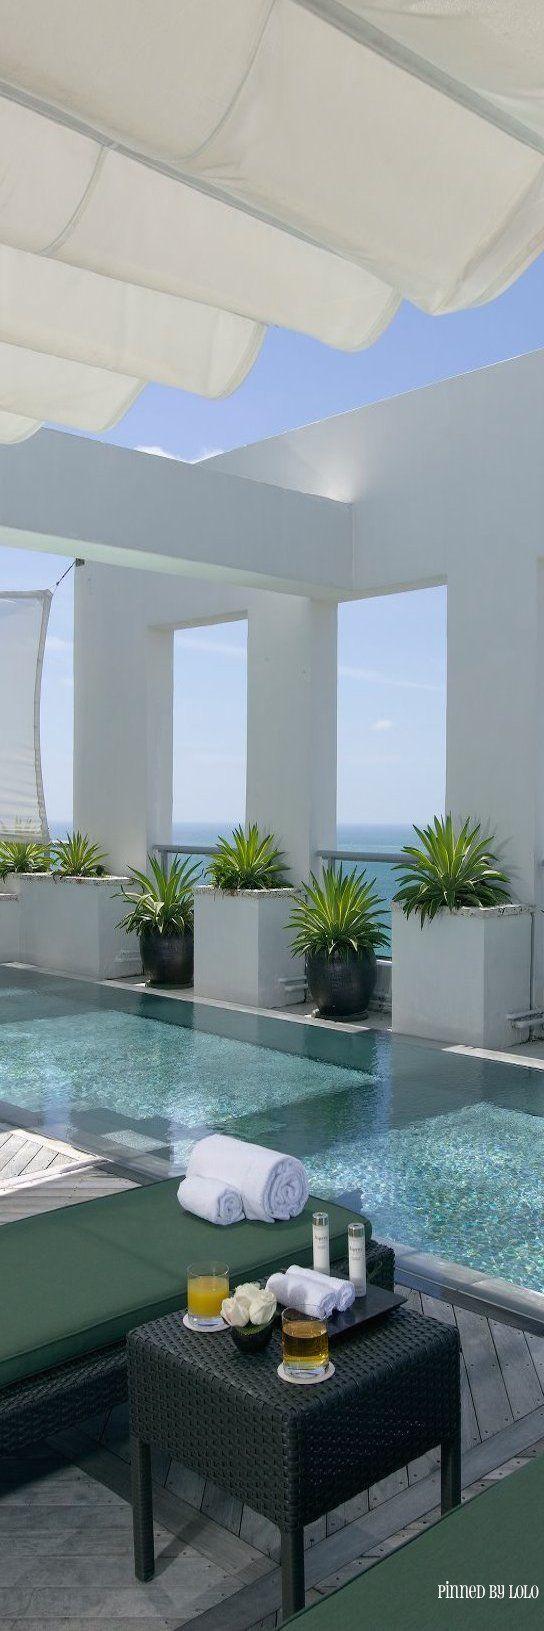 32 Best Beach House Interior Design Ideas And Decorations For 2017: Decor - Pools : Millionaire Beach House- Via LadyLuxury... - Decor Object